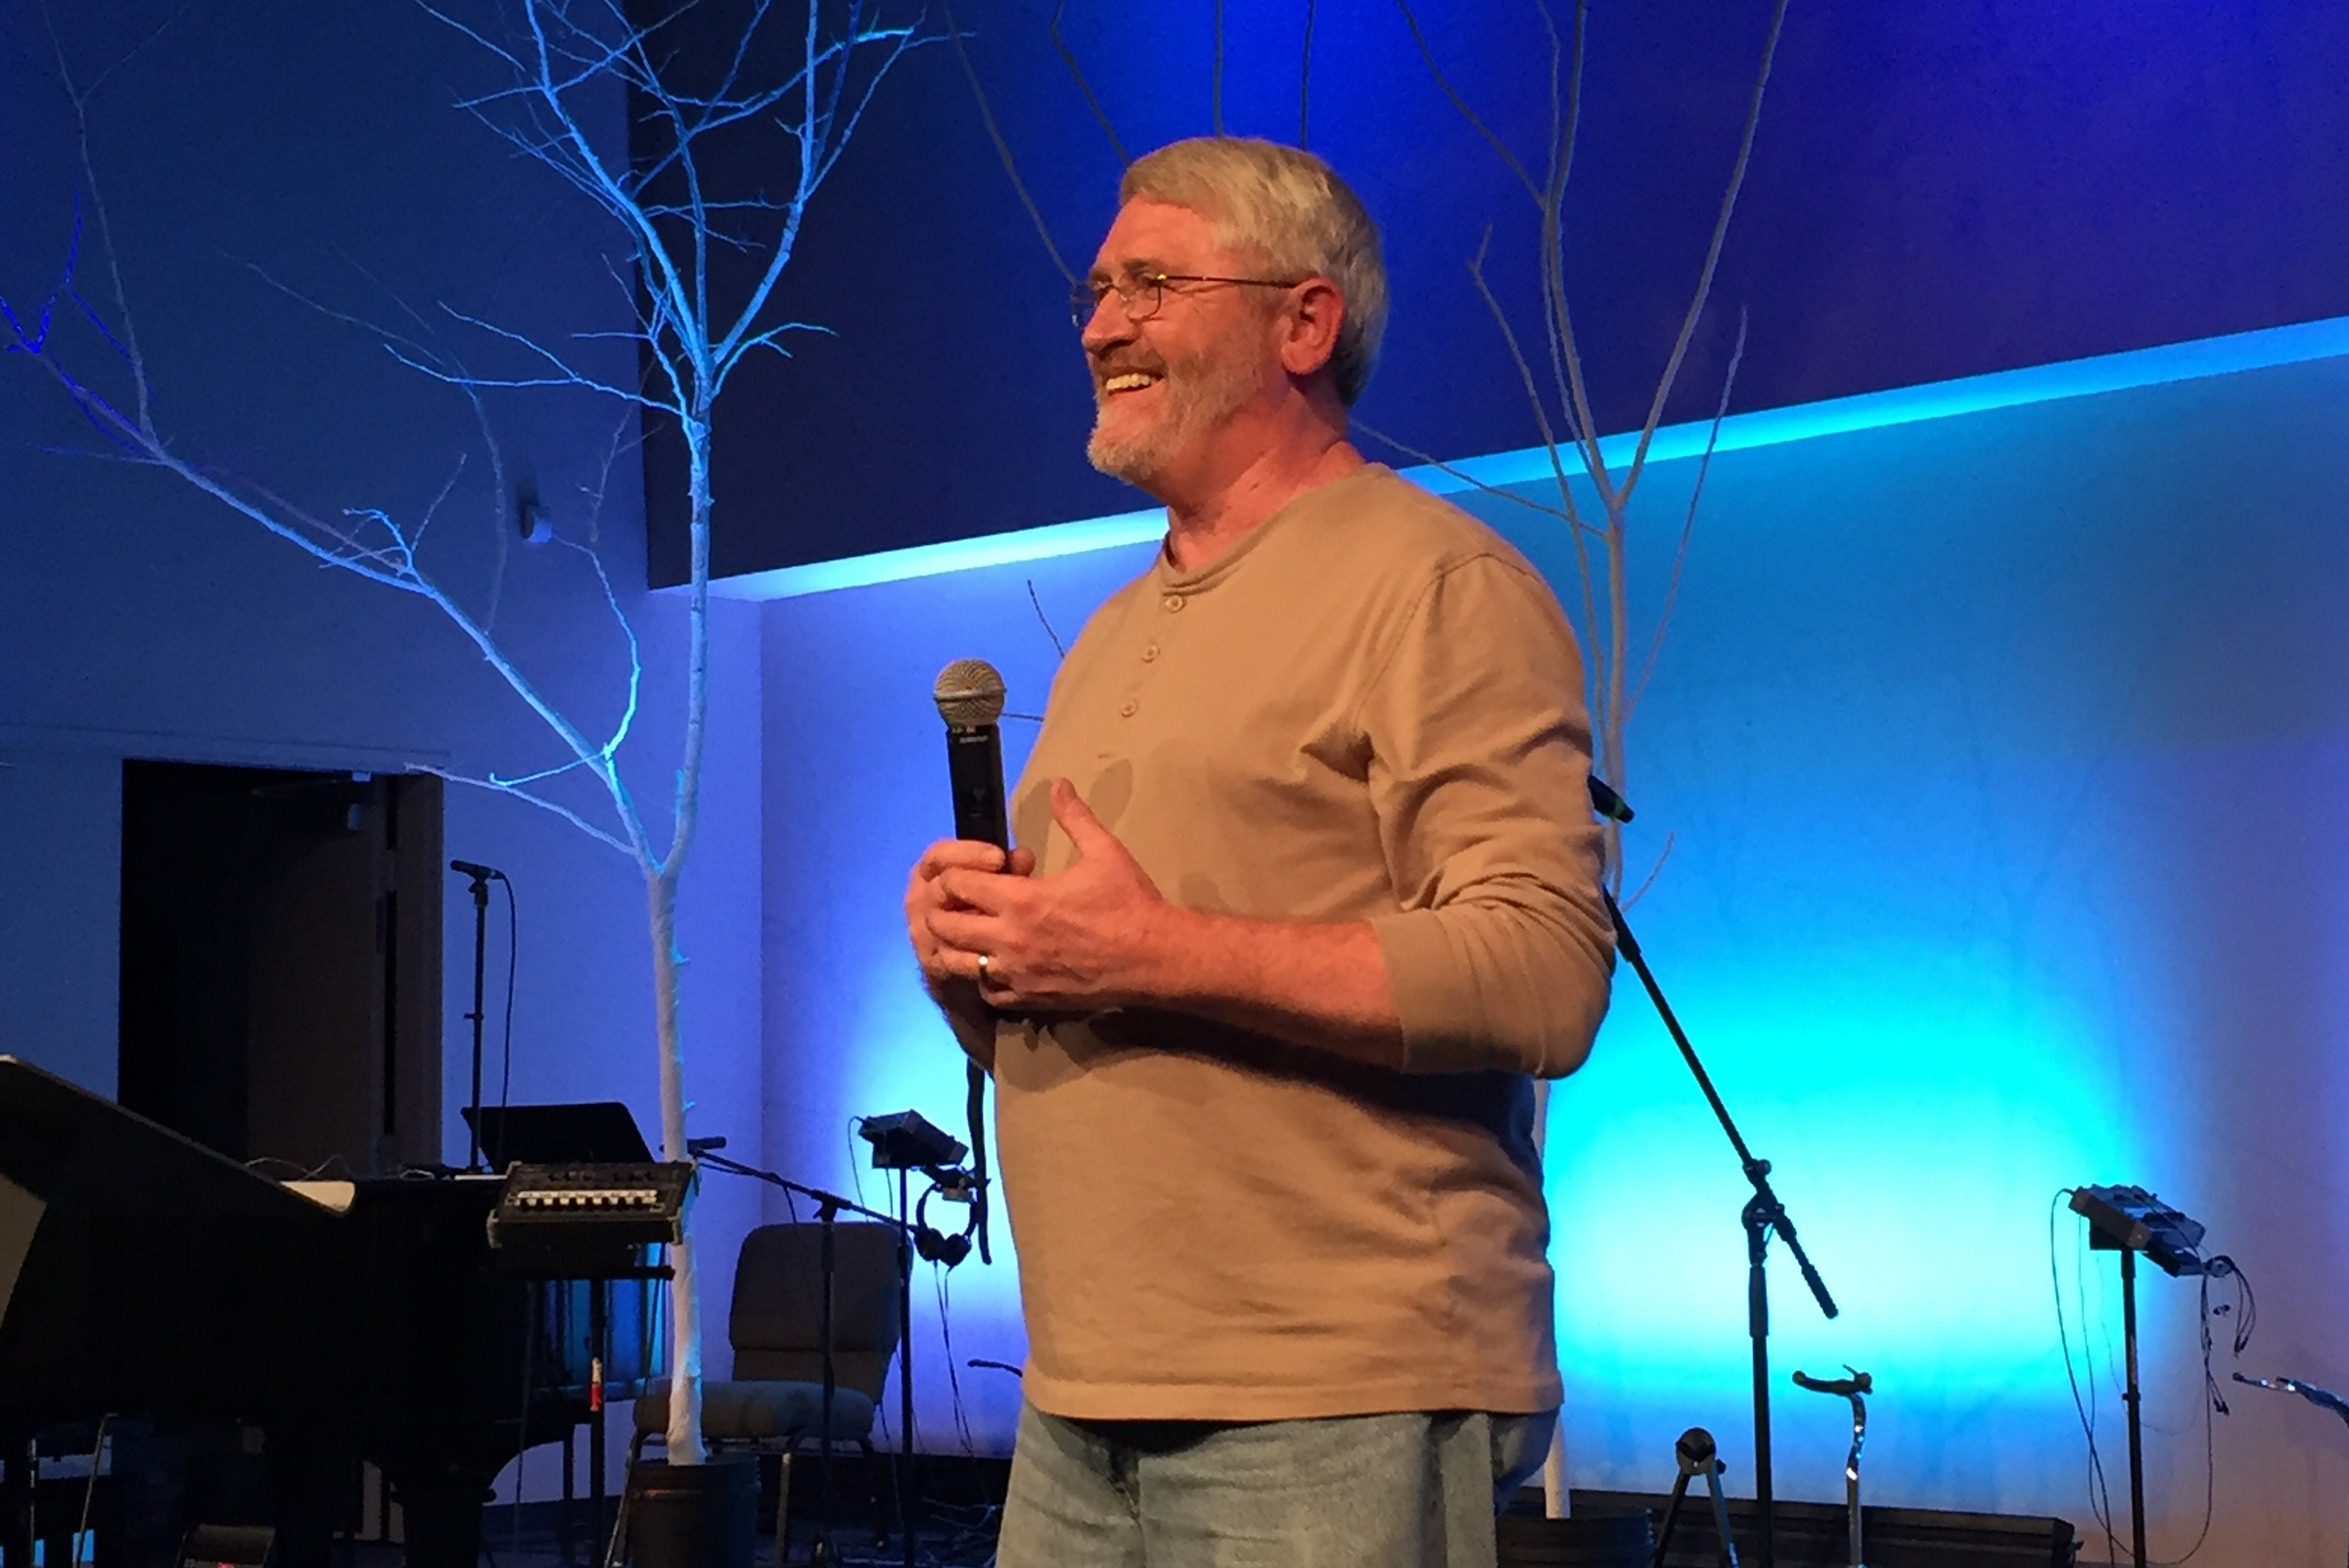 B.J. Hallmark - Associate Pastorbj@weemscreek.com